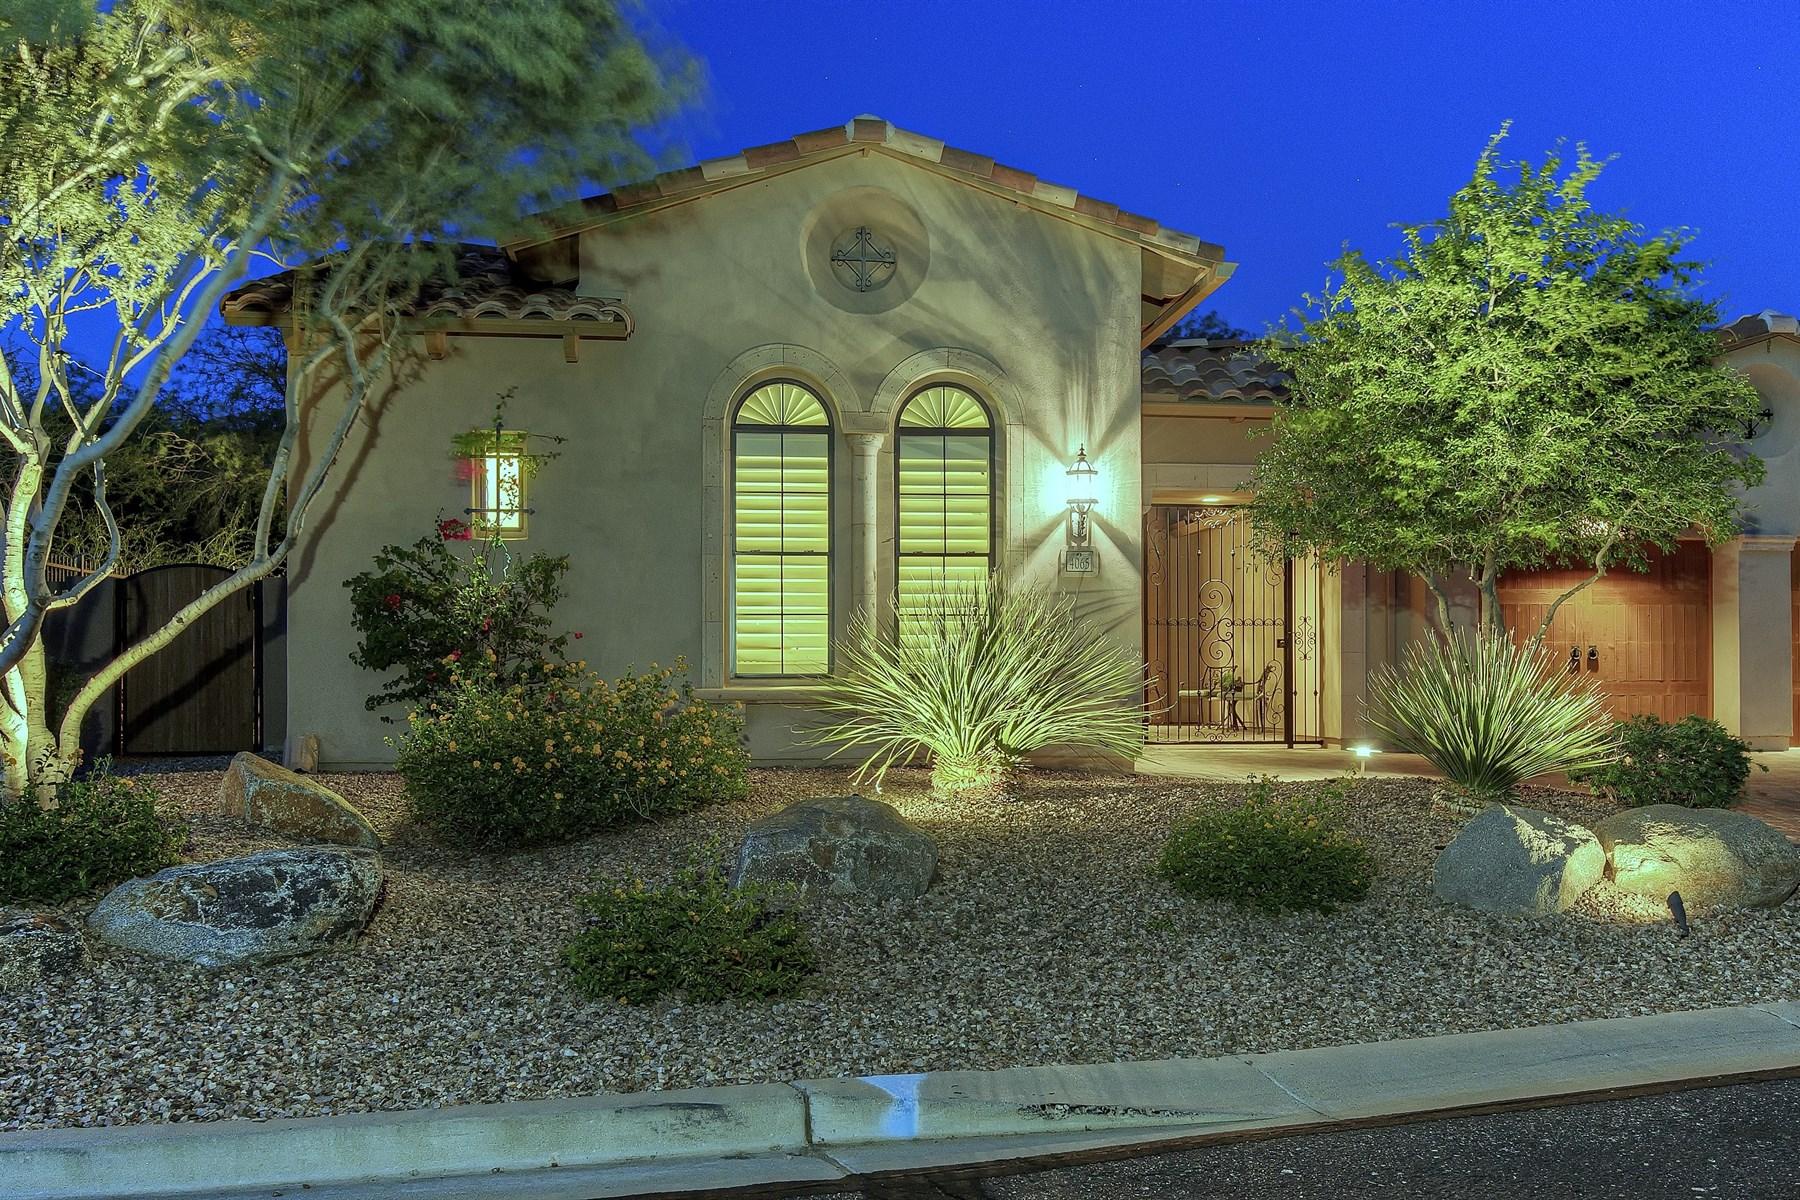 Nhà ở một gia đình vì Bán tại Stunning gated Las Sendas Mountain home 4065 N SILVER RIDGE CIR Mesa, Arizona 85207 Hoa Kỳ